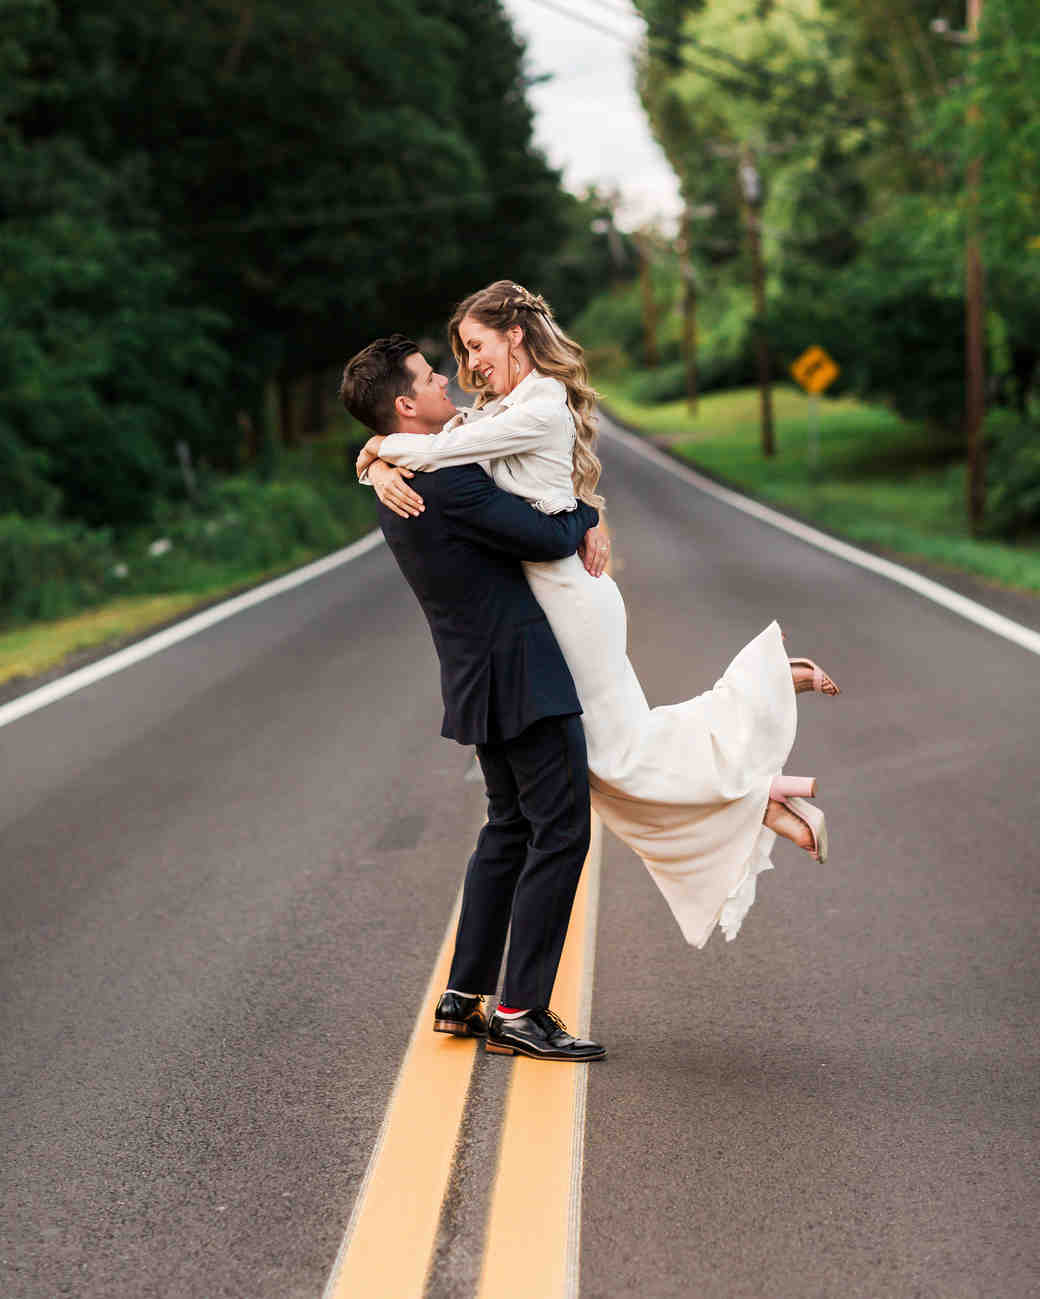 vanessa steven wedding couple road embrace